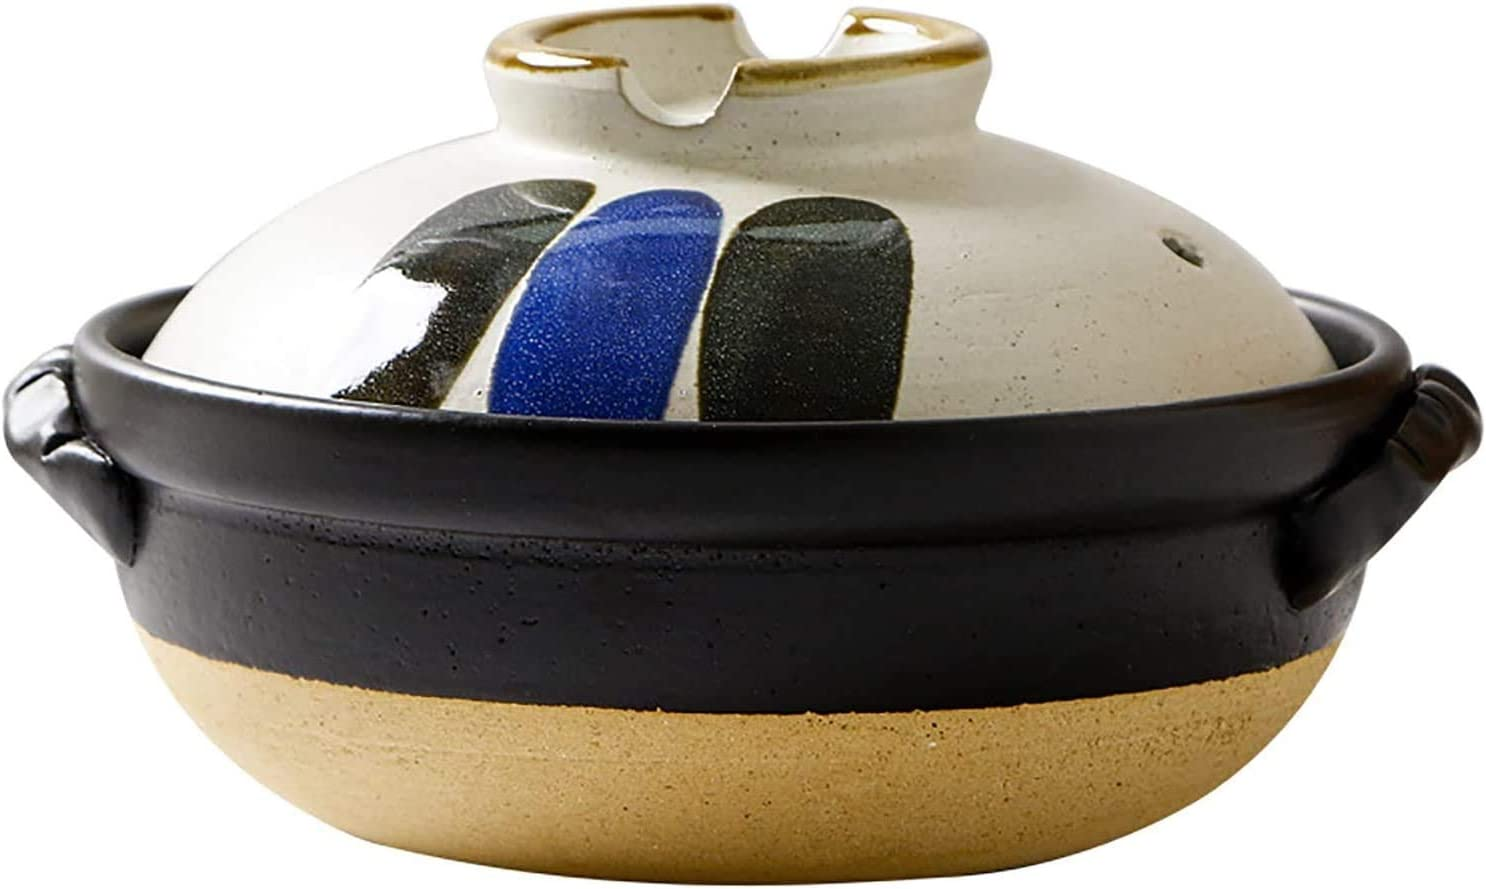 High material Stew pot Japanese Colorful Ceramic Cookware D Pot Casserole New Orleans Mall Hot